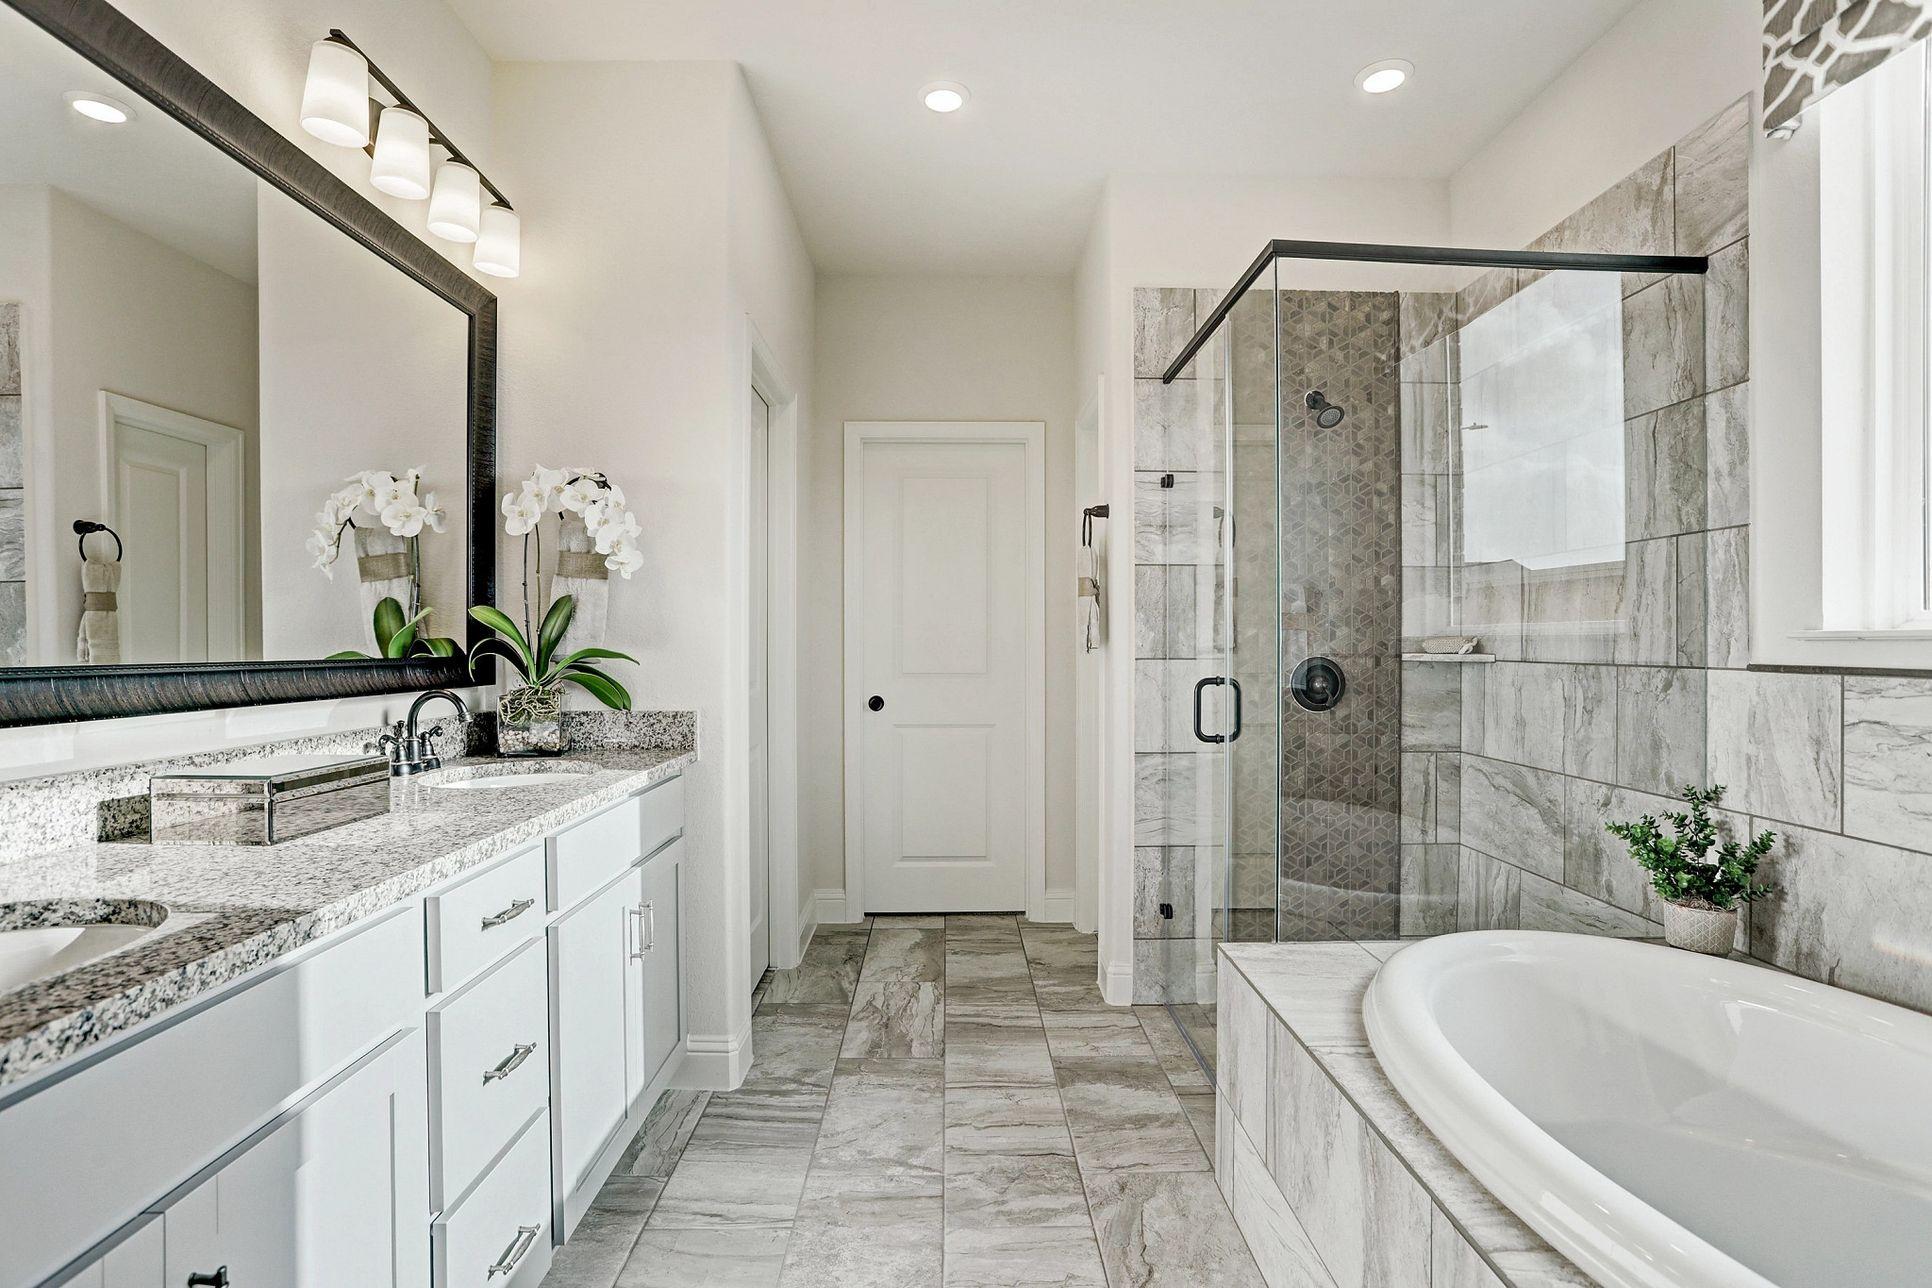 Meridiana 50 Plan 4069 Owner Bath:Plan 4069 Owner Bath